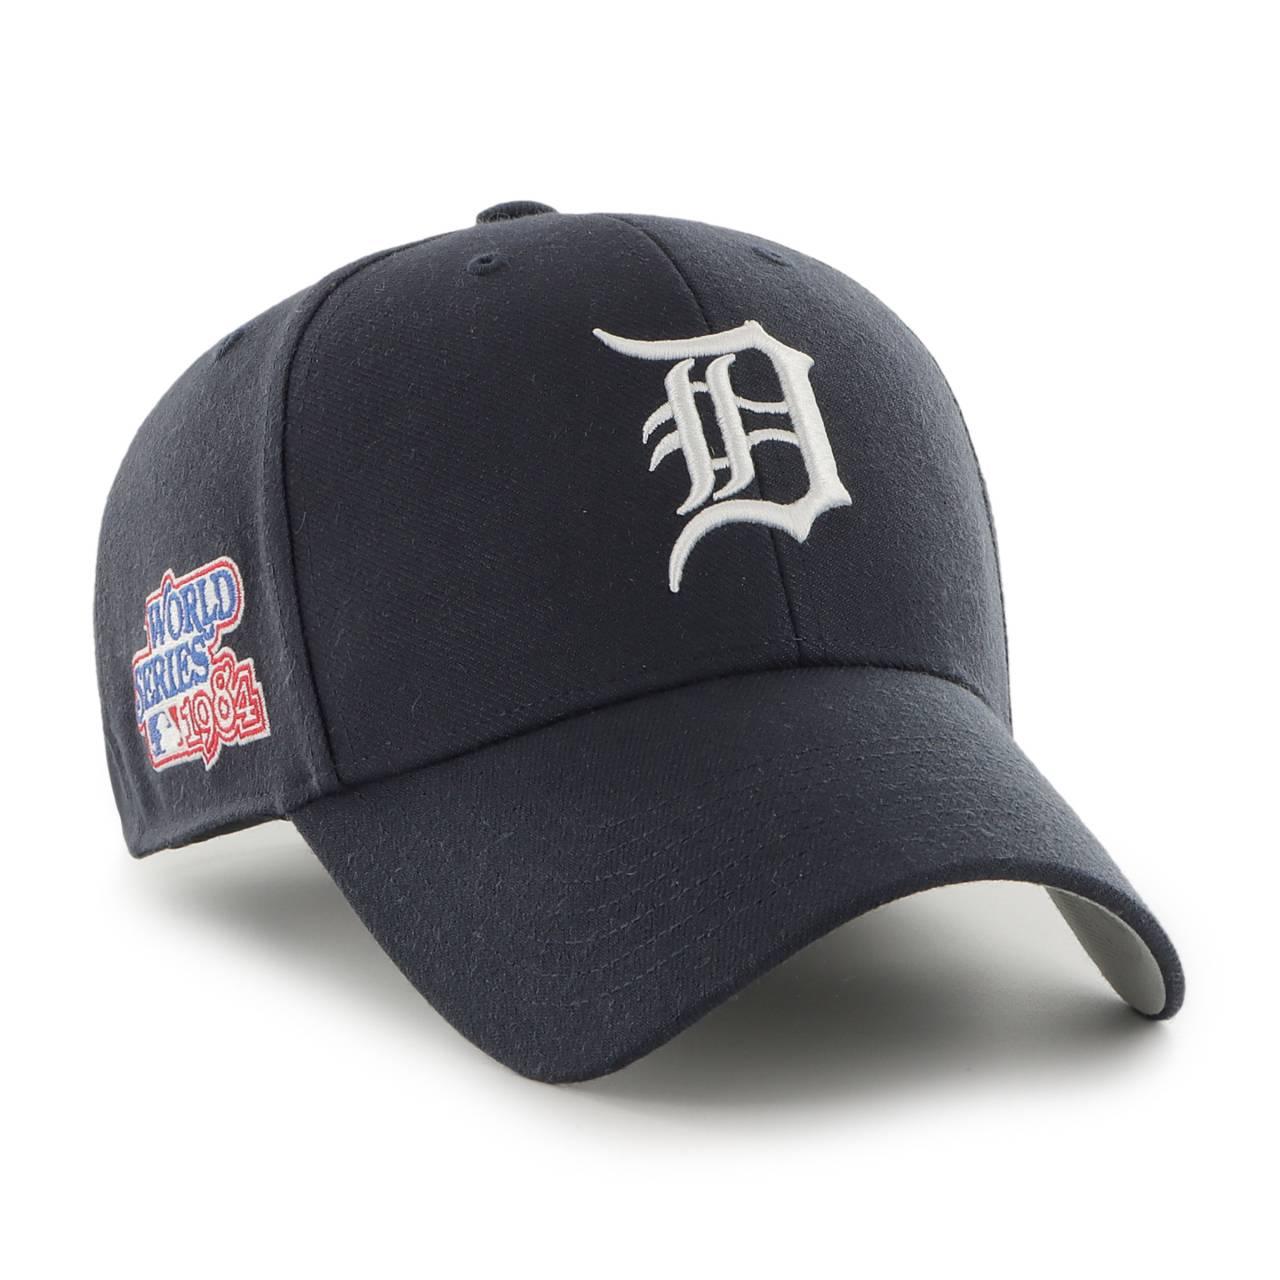 MLB DETROIT TIGERS SURE SHOT SNAPBACK TT '47 MVP